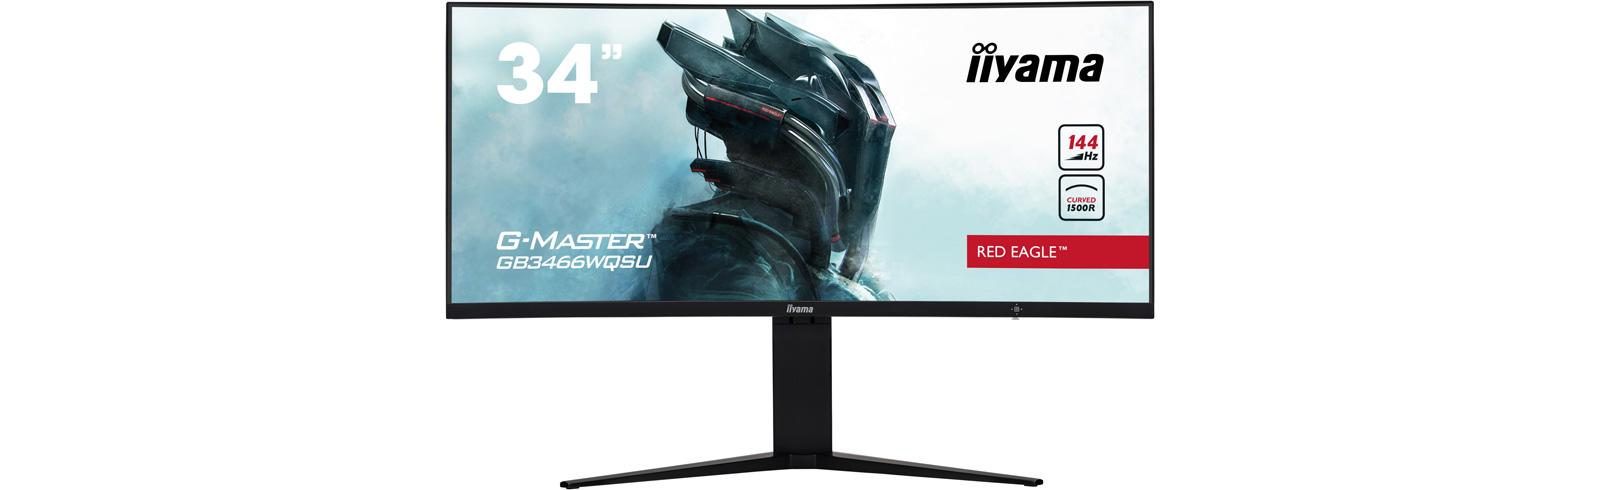 iiyama GB3466WQSU - an ultra-wide curved gaming monitor with AMD FreeSync Premium Pro support